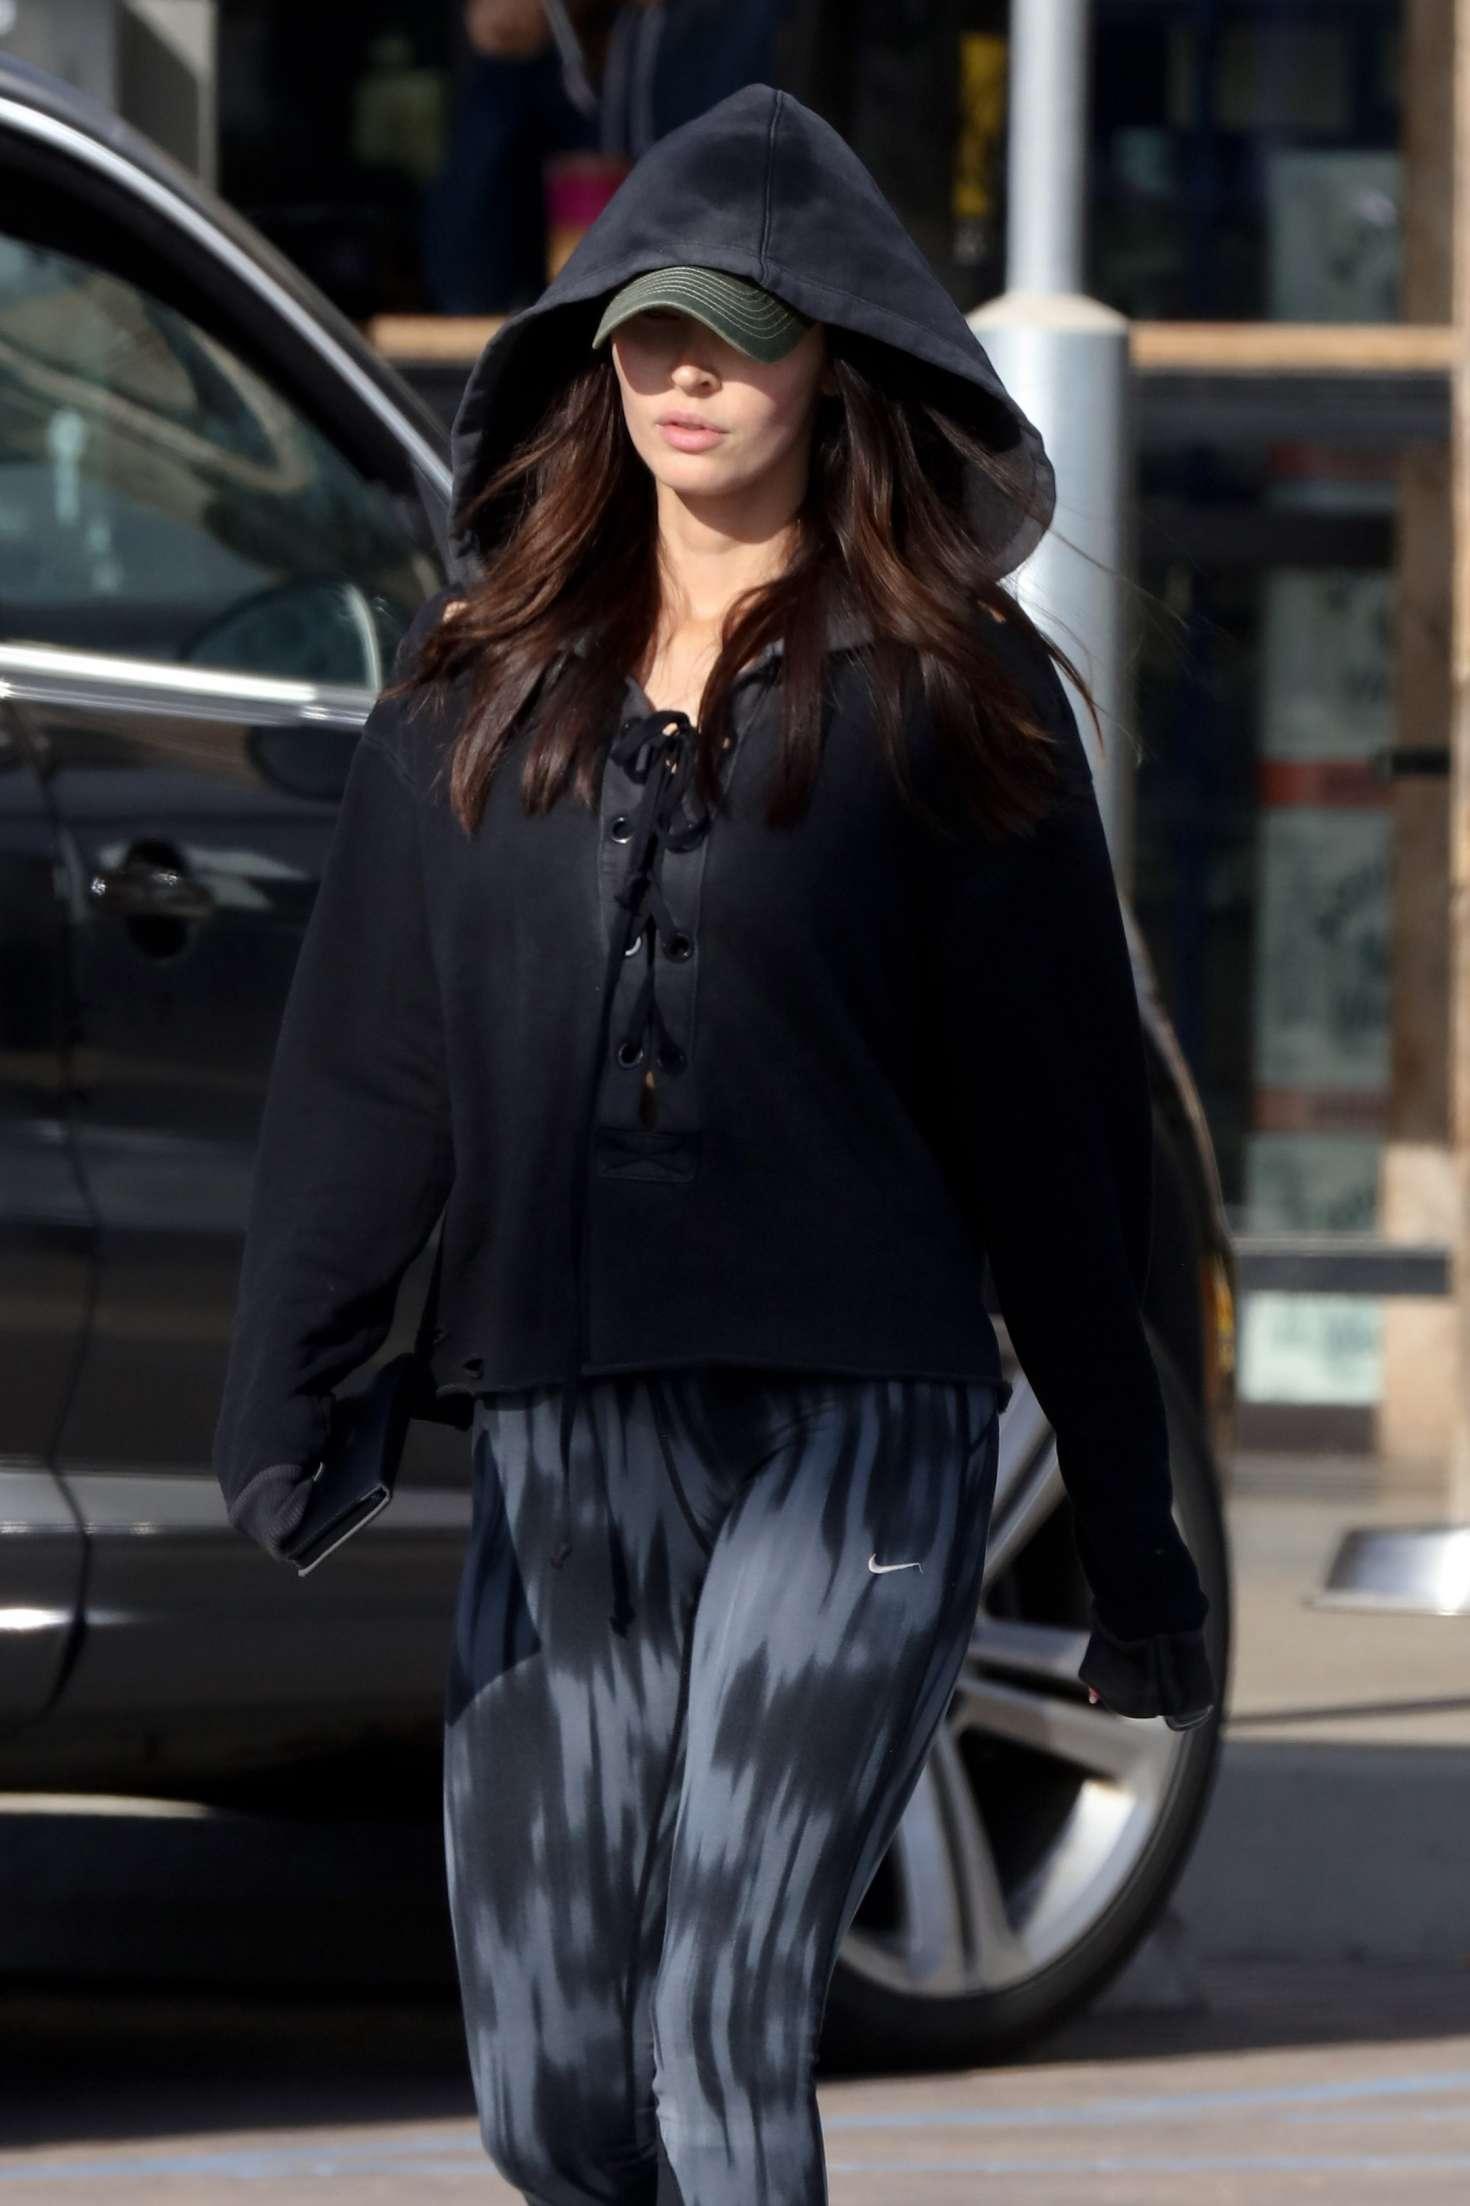 Megan Fox Shops At Trancas Country Market In Malibu